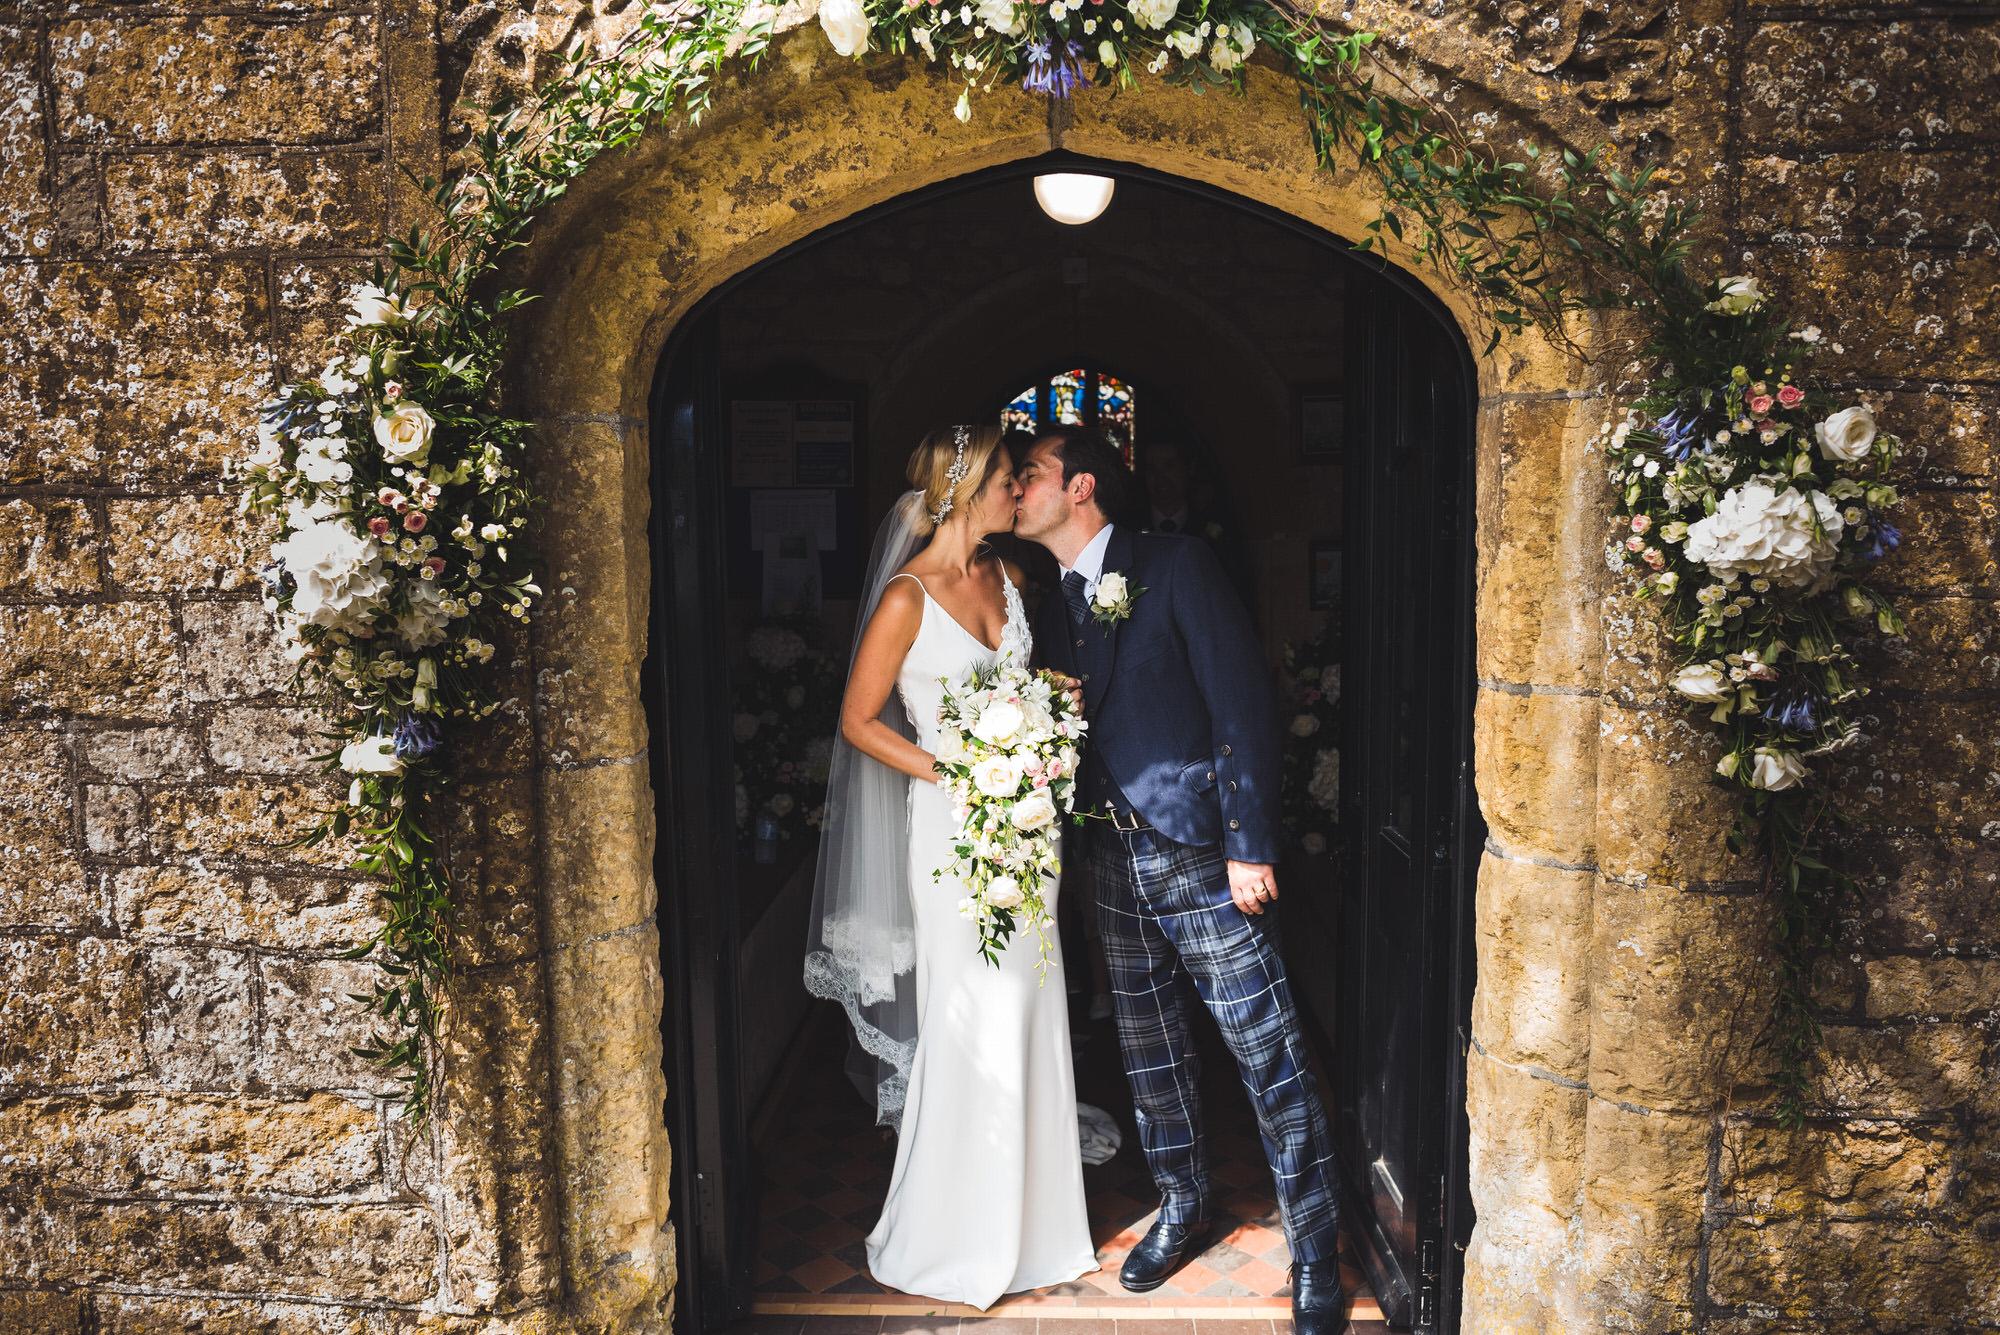 Dorset marquee wedding by the sea simon biffen photography 19